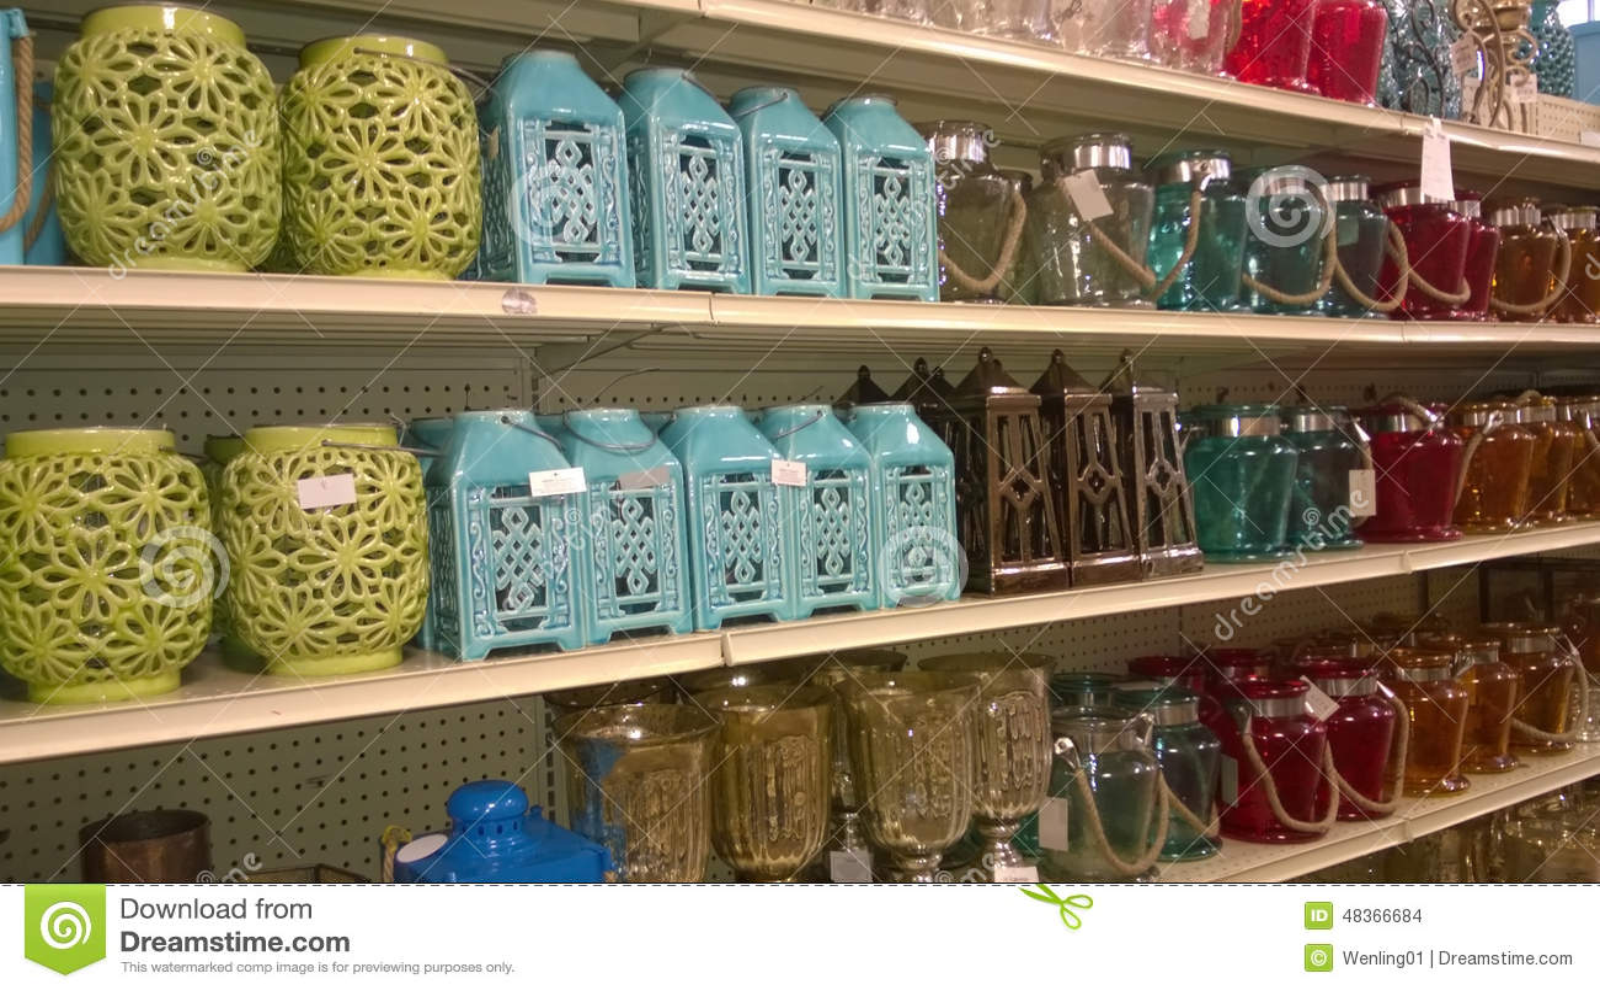 Lamp Lanterns On Shelves Selling Editorial Stock Image - Image of ...